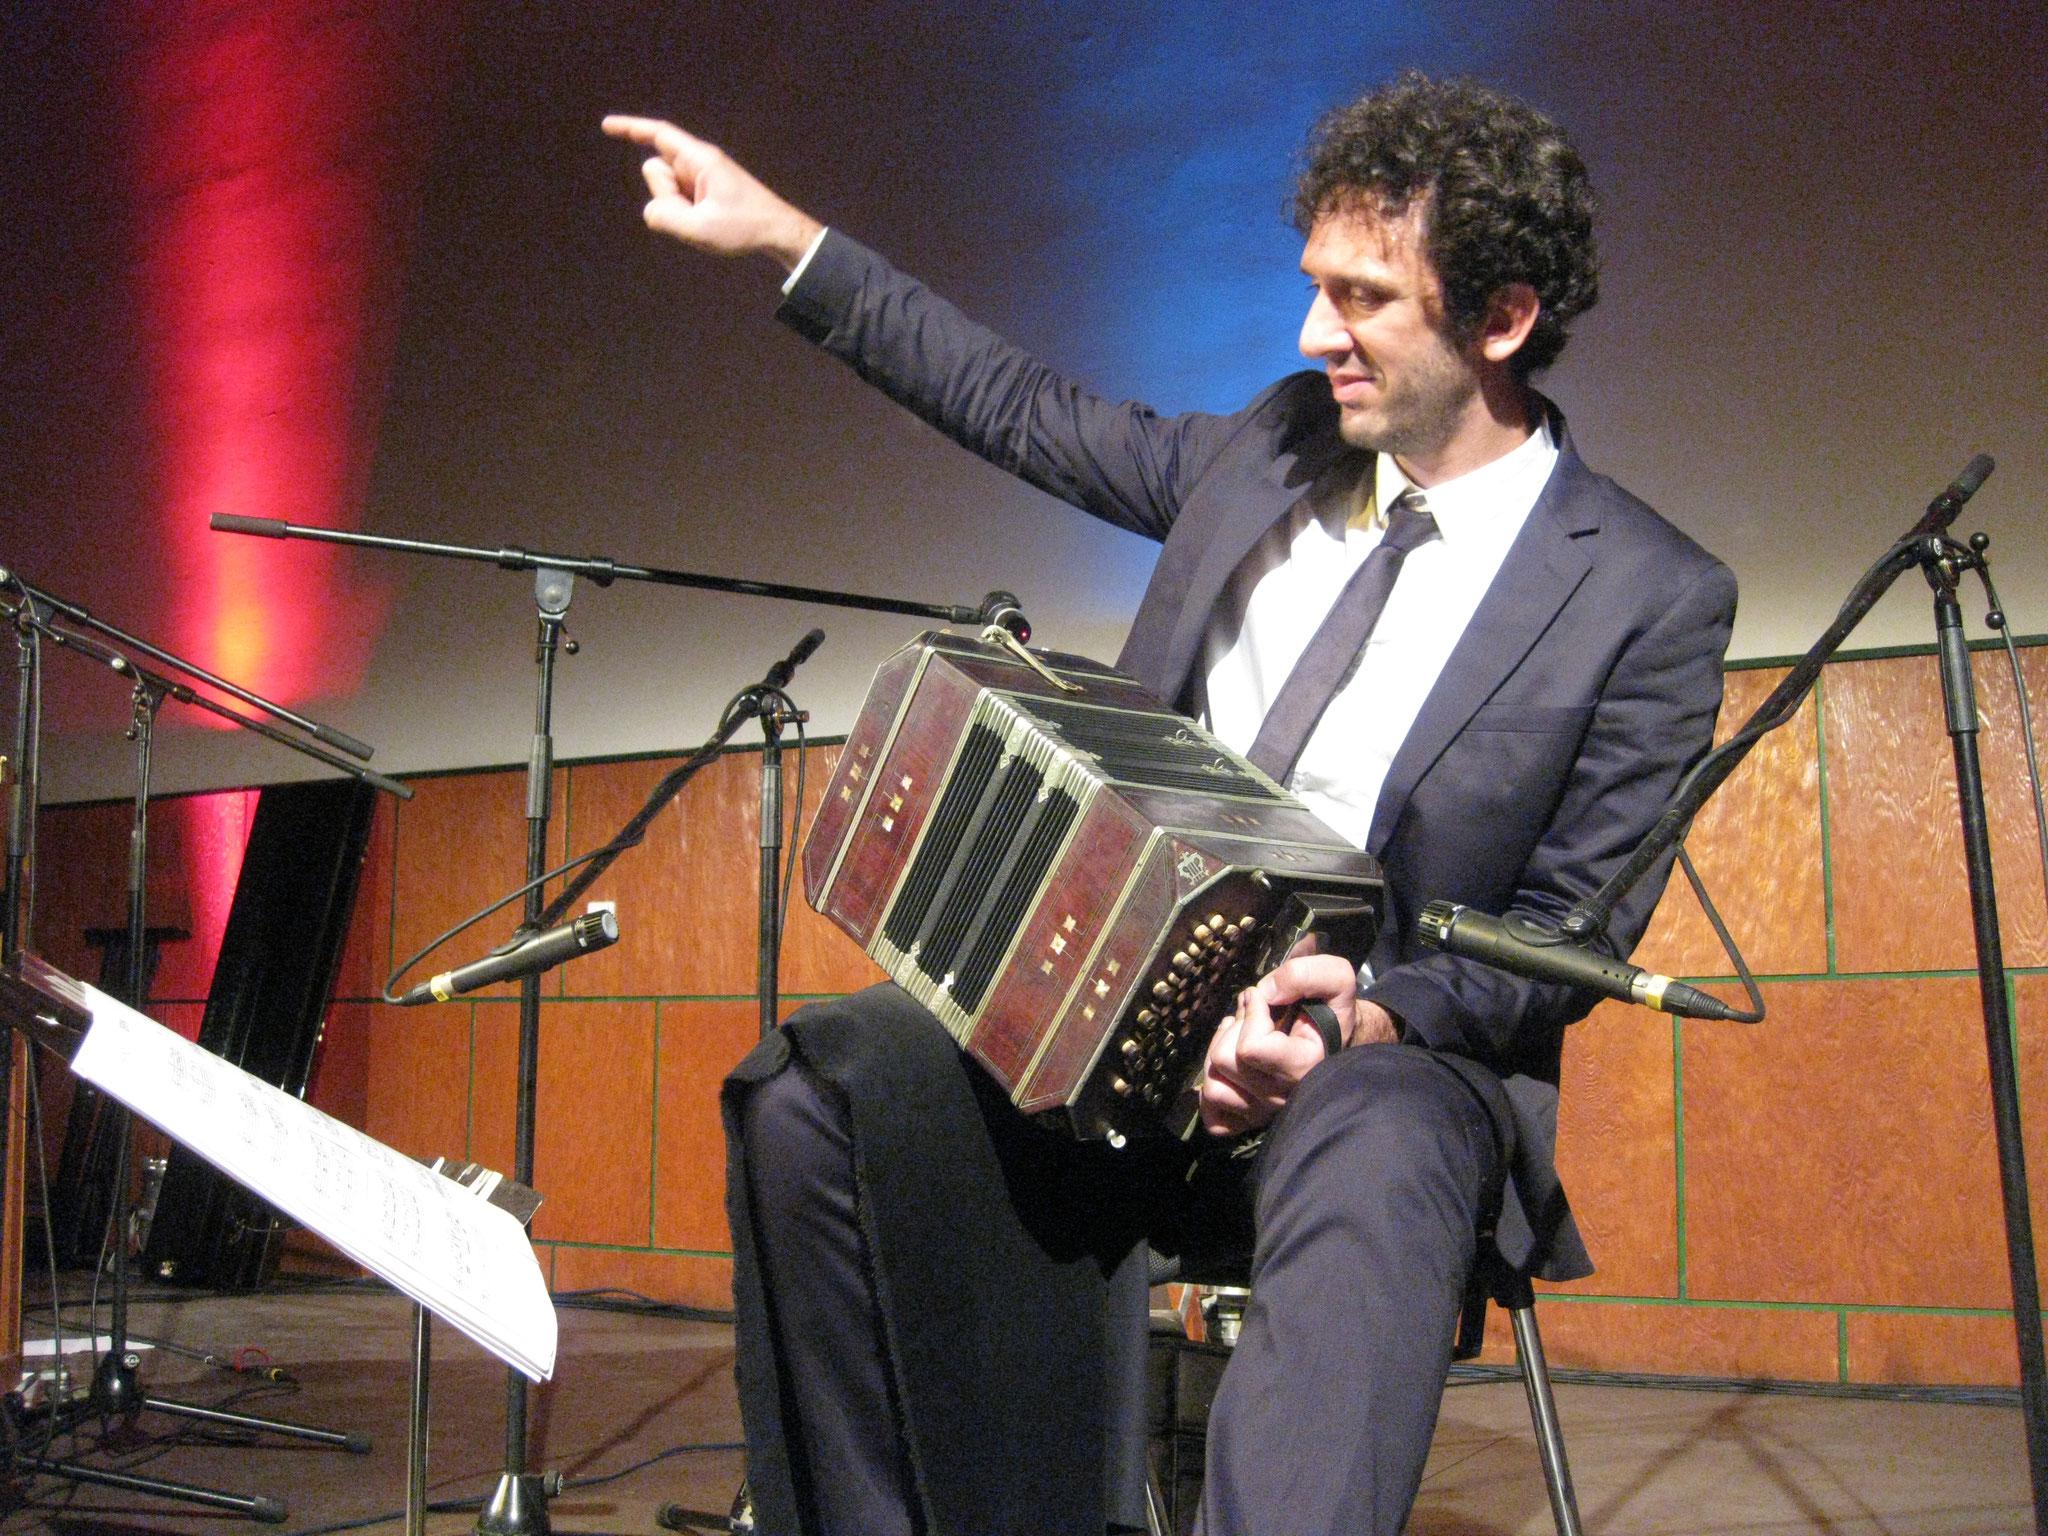 Leandro vom Duo Ranas 2010